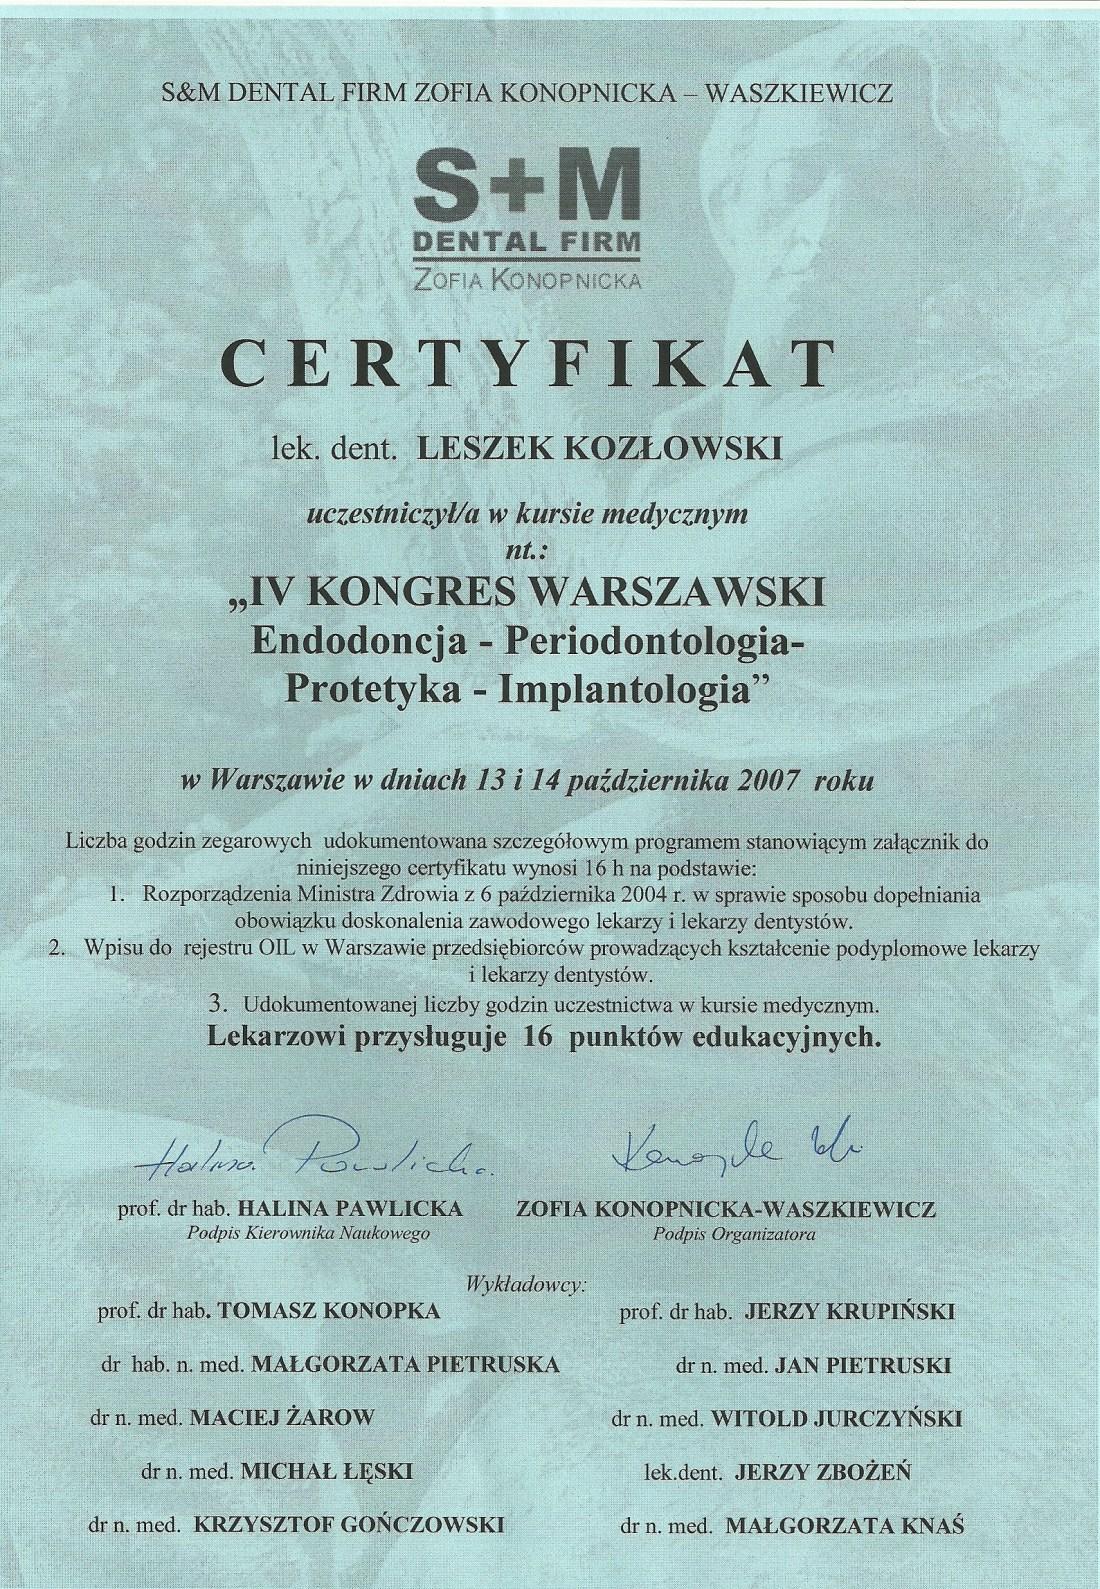 dentysta warszawa DENTYSTA WARSZAWA – DENTOKLINIKA Dentysta warszawa Leszek Kozlowski Certyfikat 2